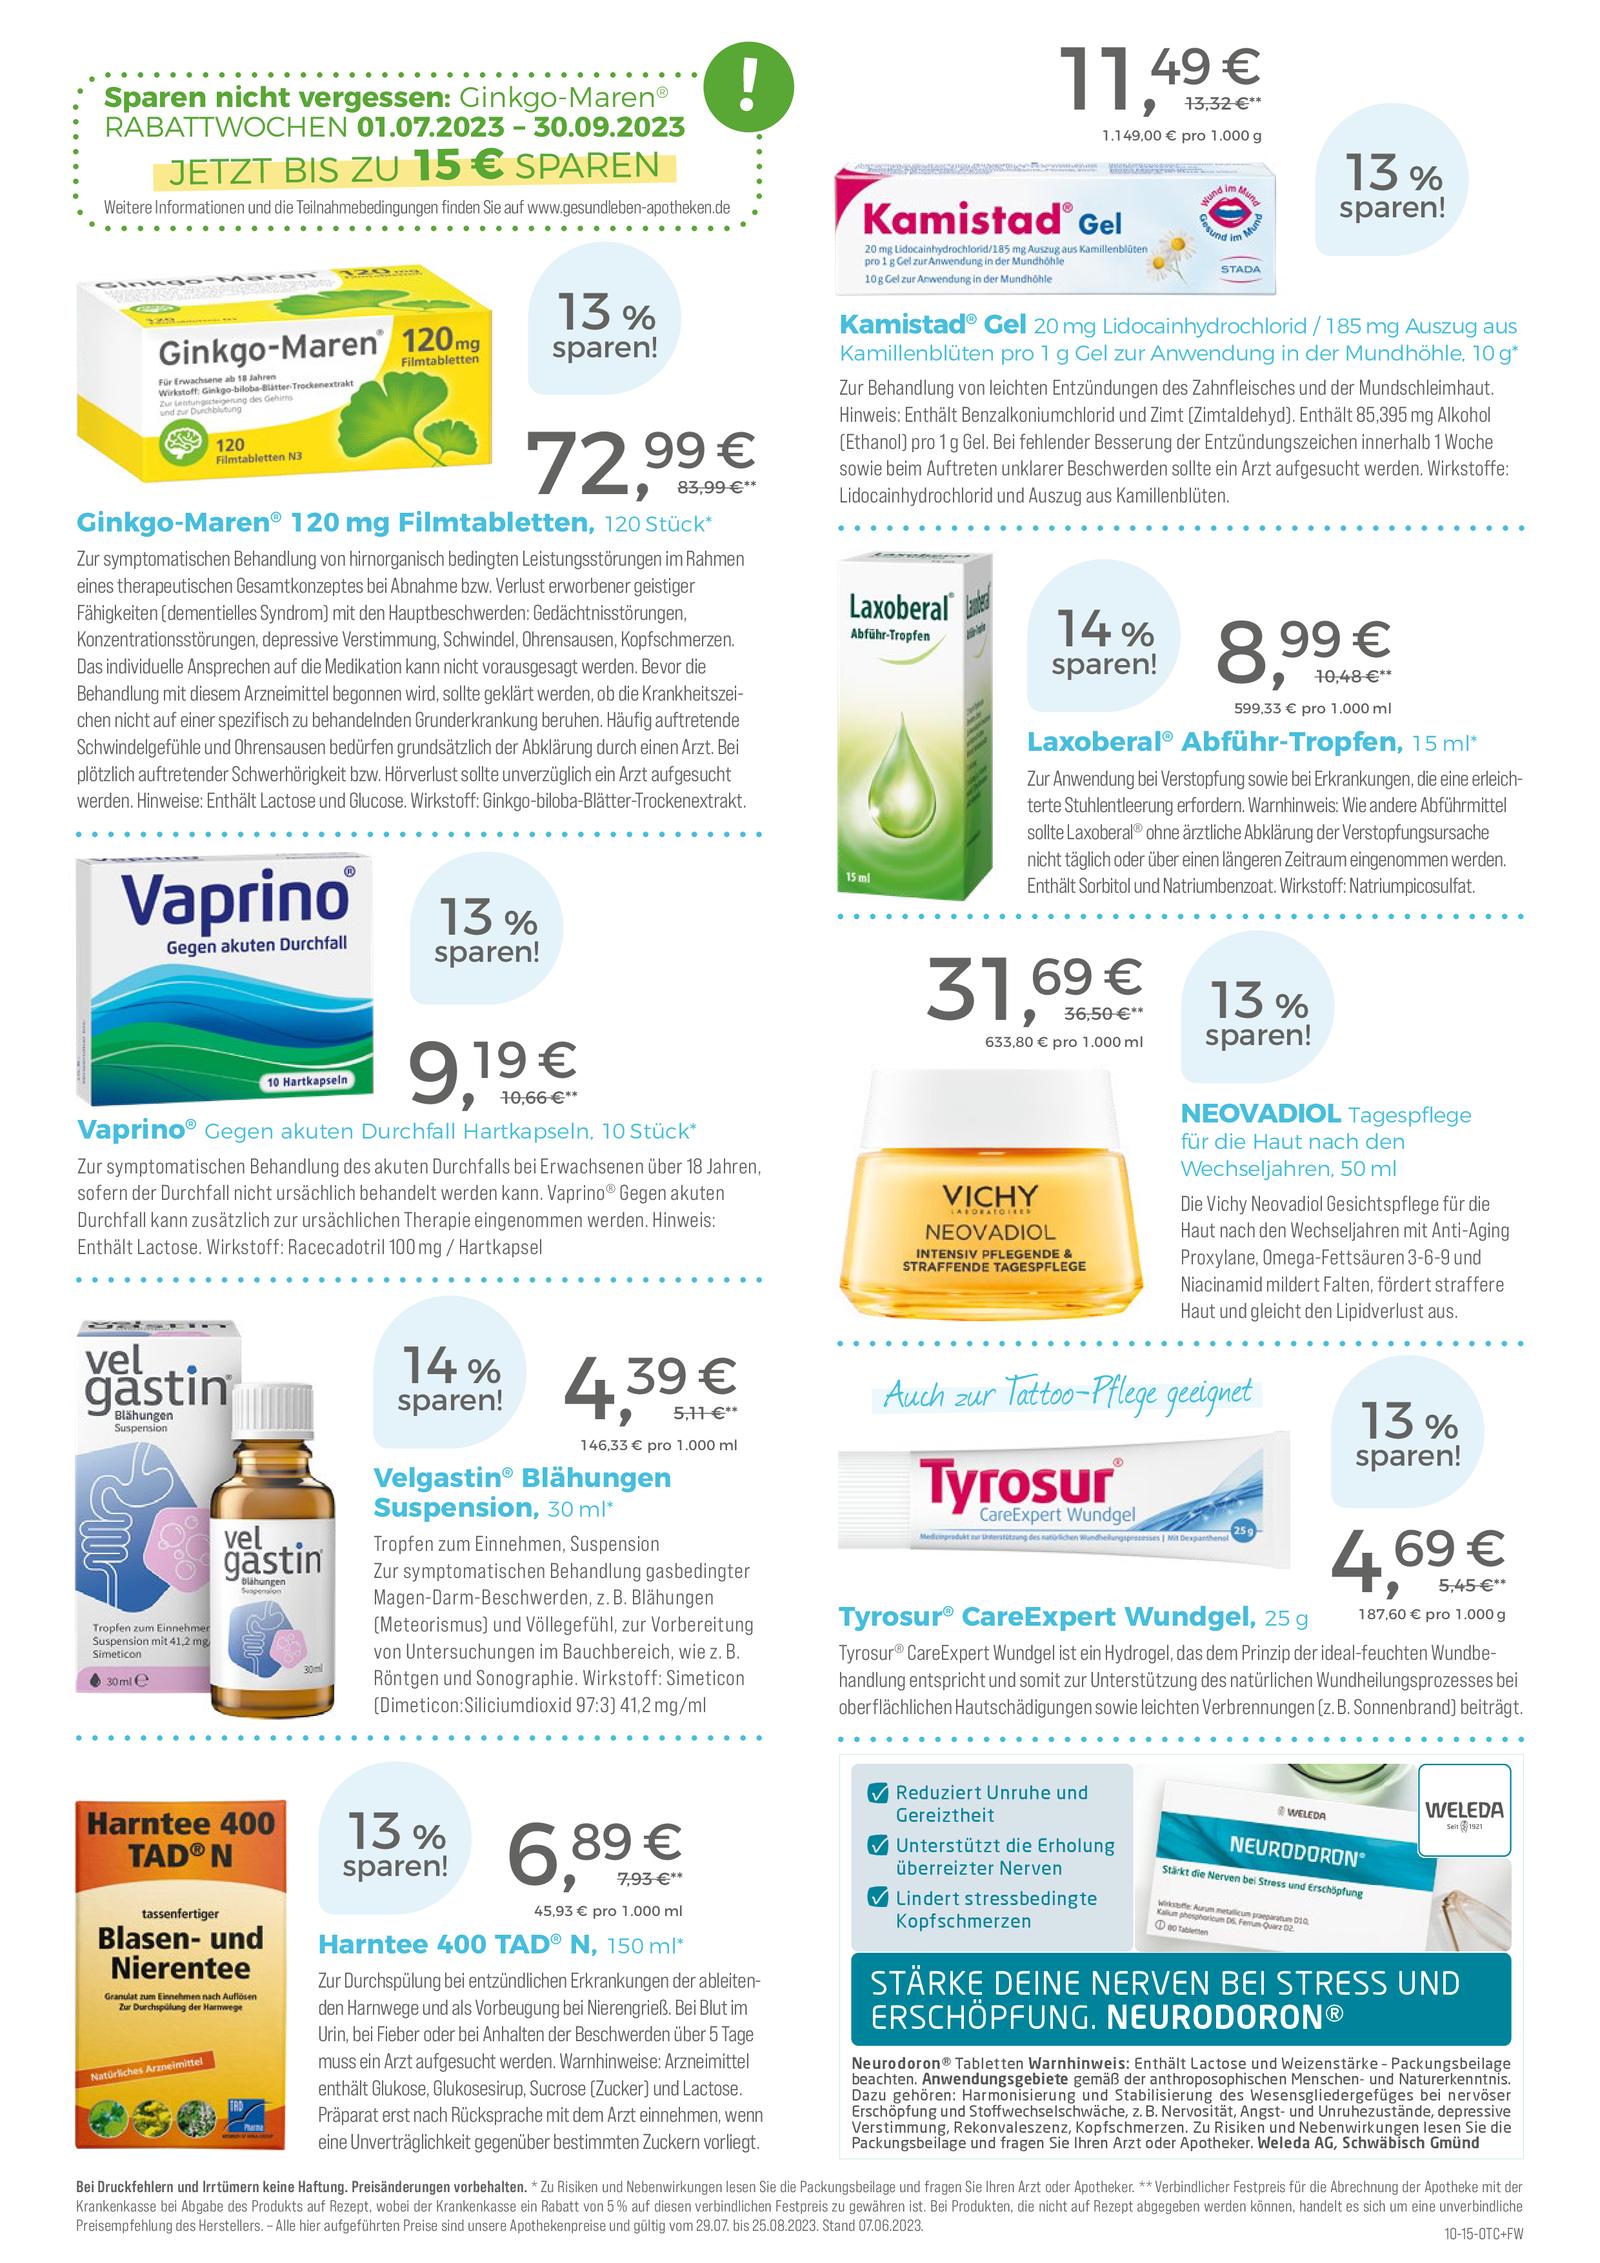 https://mein-uploads.apocdn.net/1036/leaflets/gesundleben_niedrig-Seite3.png